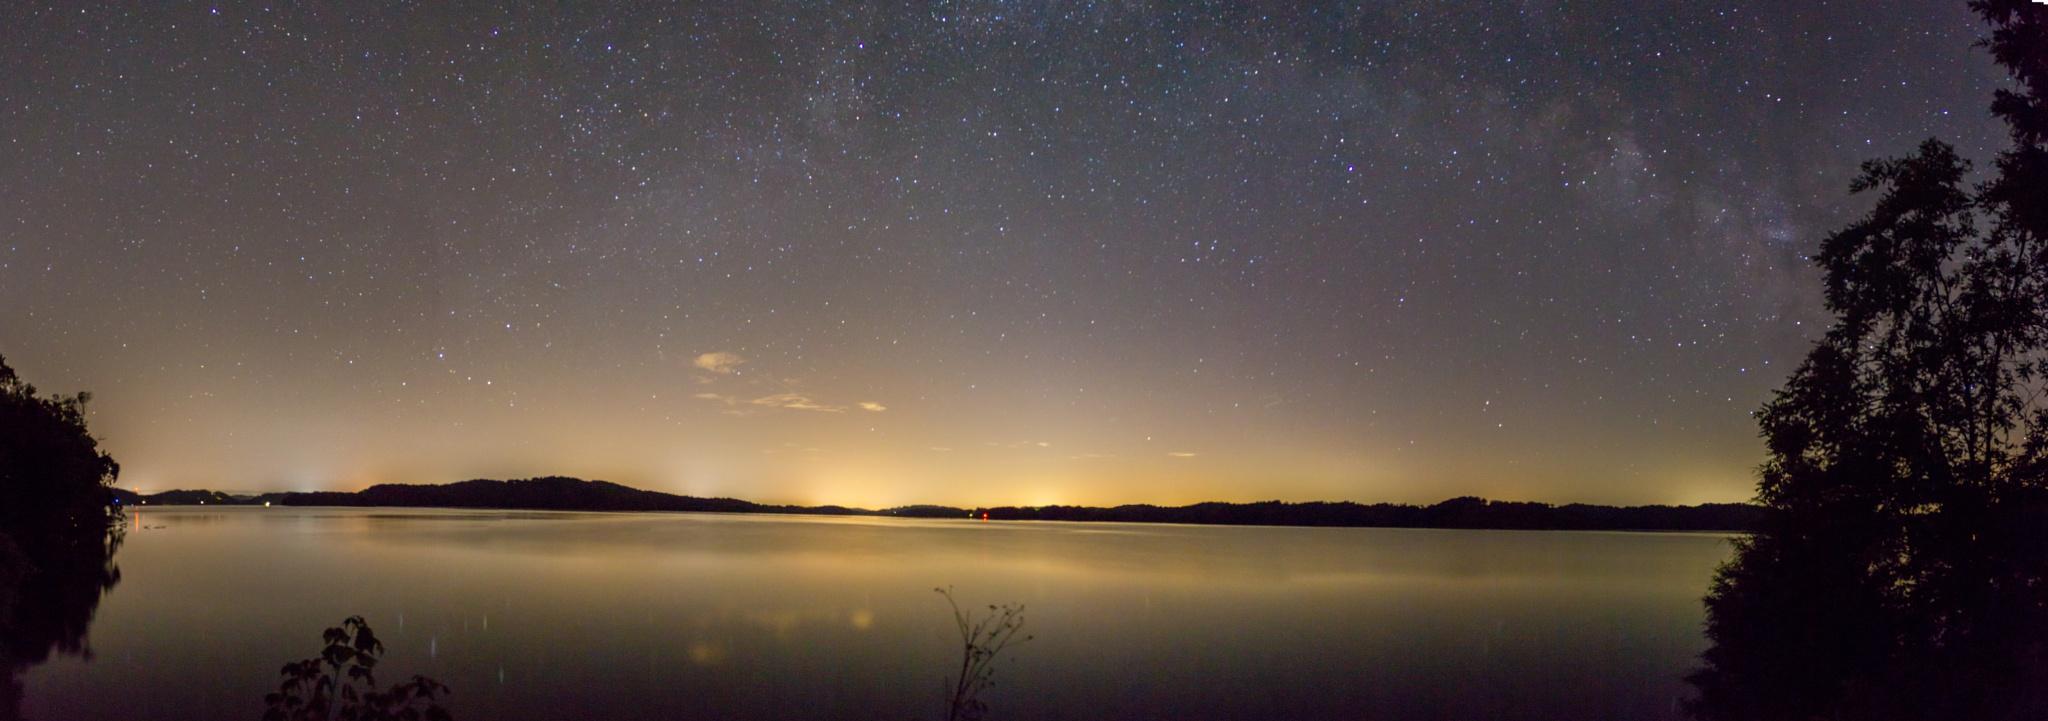 Lake and sky by manofhg